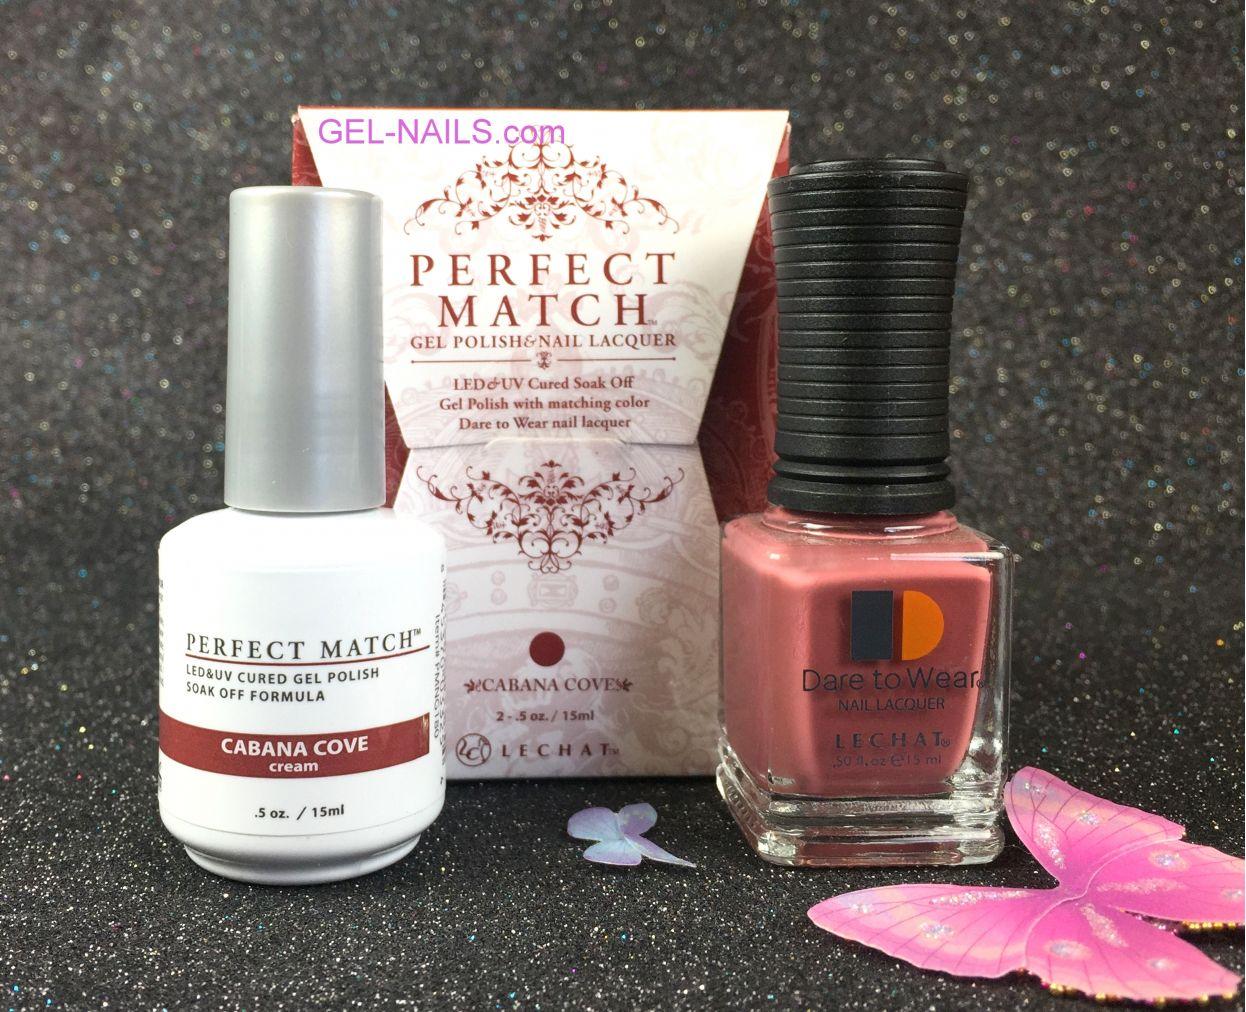 Lechat Perfect Match Cabana Cove Pms180 Gel Polish Nail Lacquer